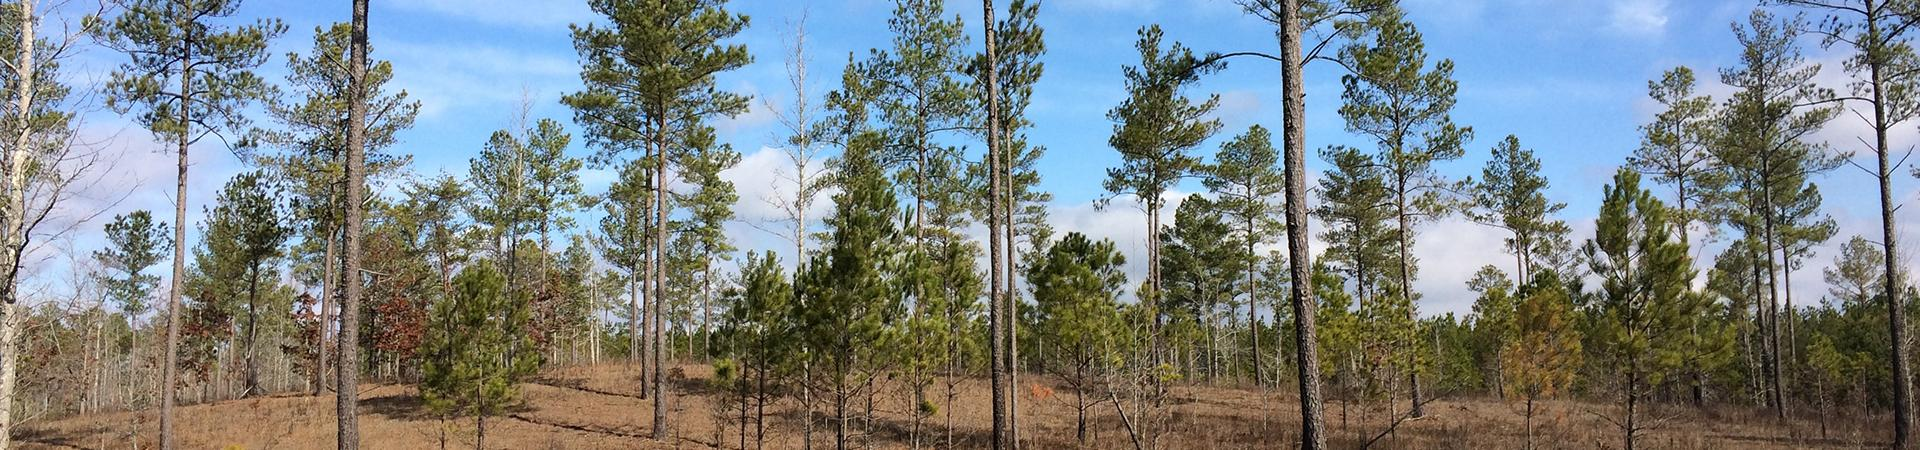 pines at Coosawattee Wildlife Management Area